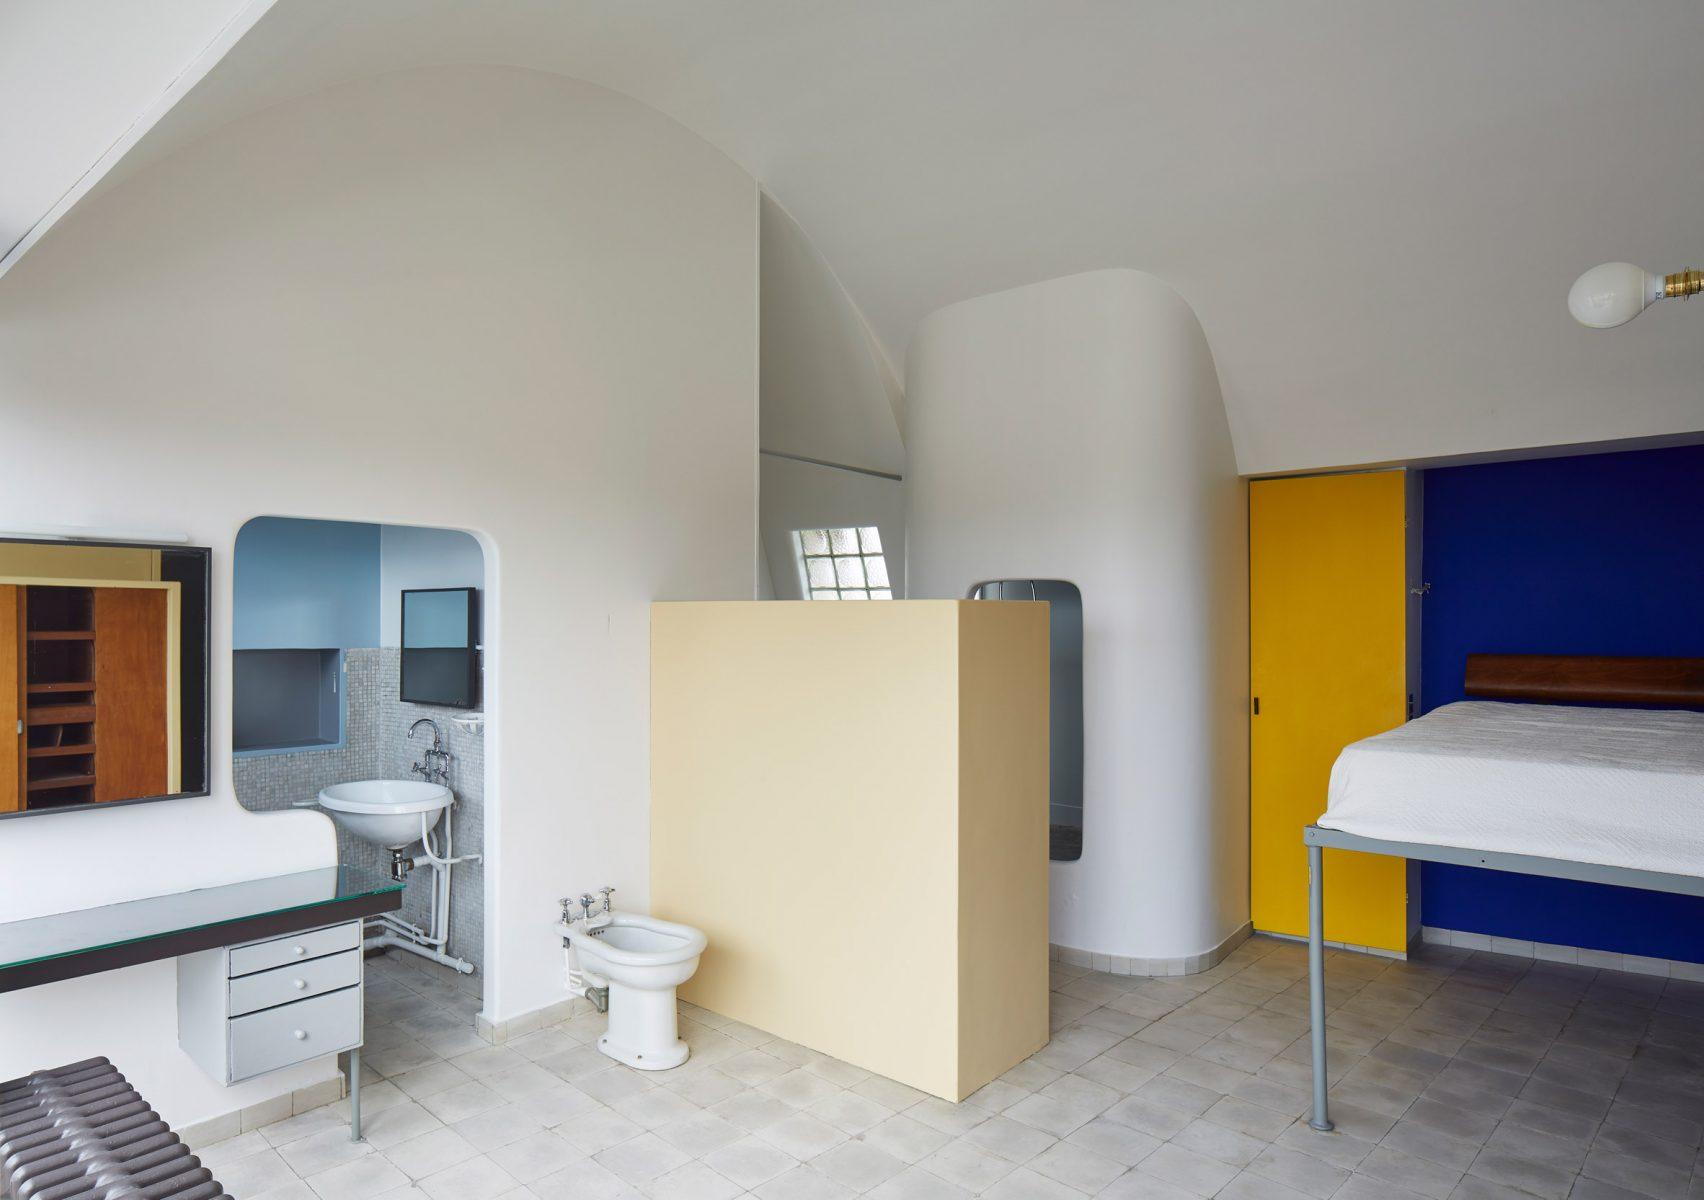 KTS Le Corbusier 2